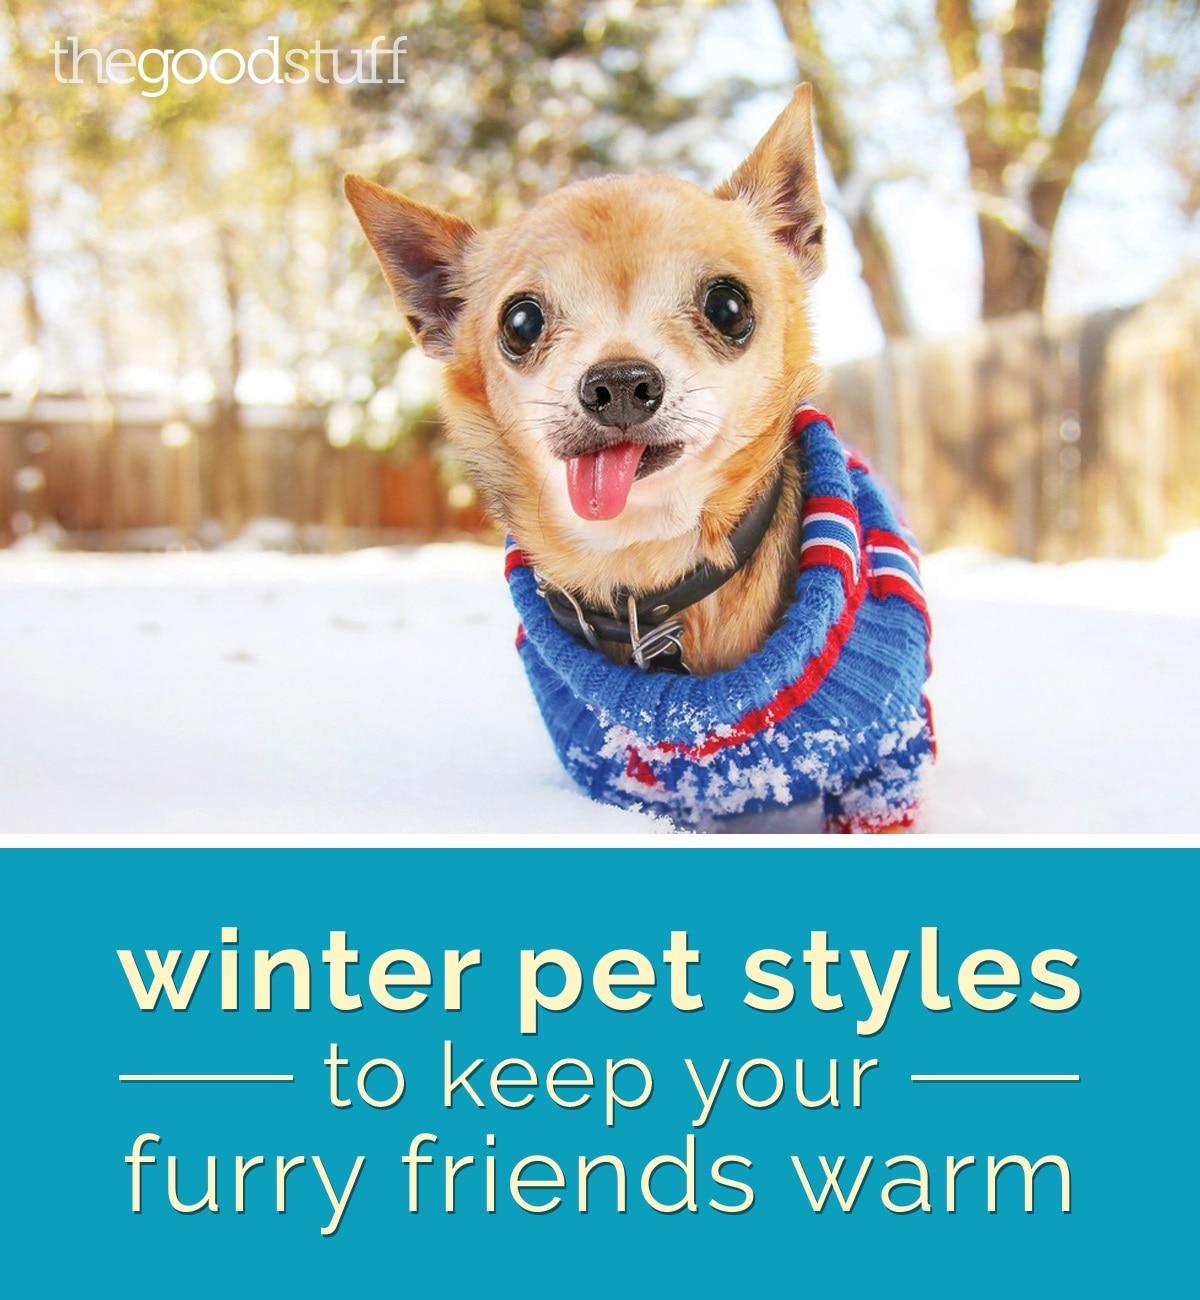 style-winter-pet-styles